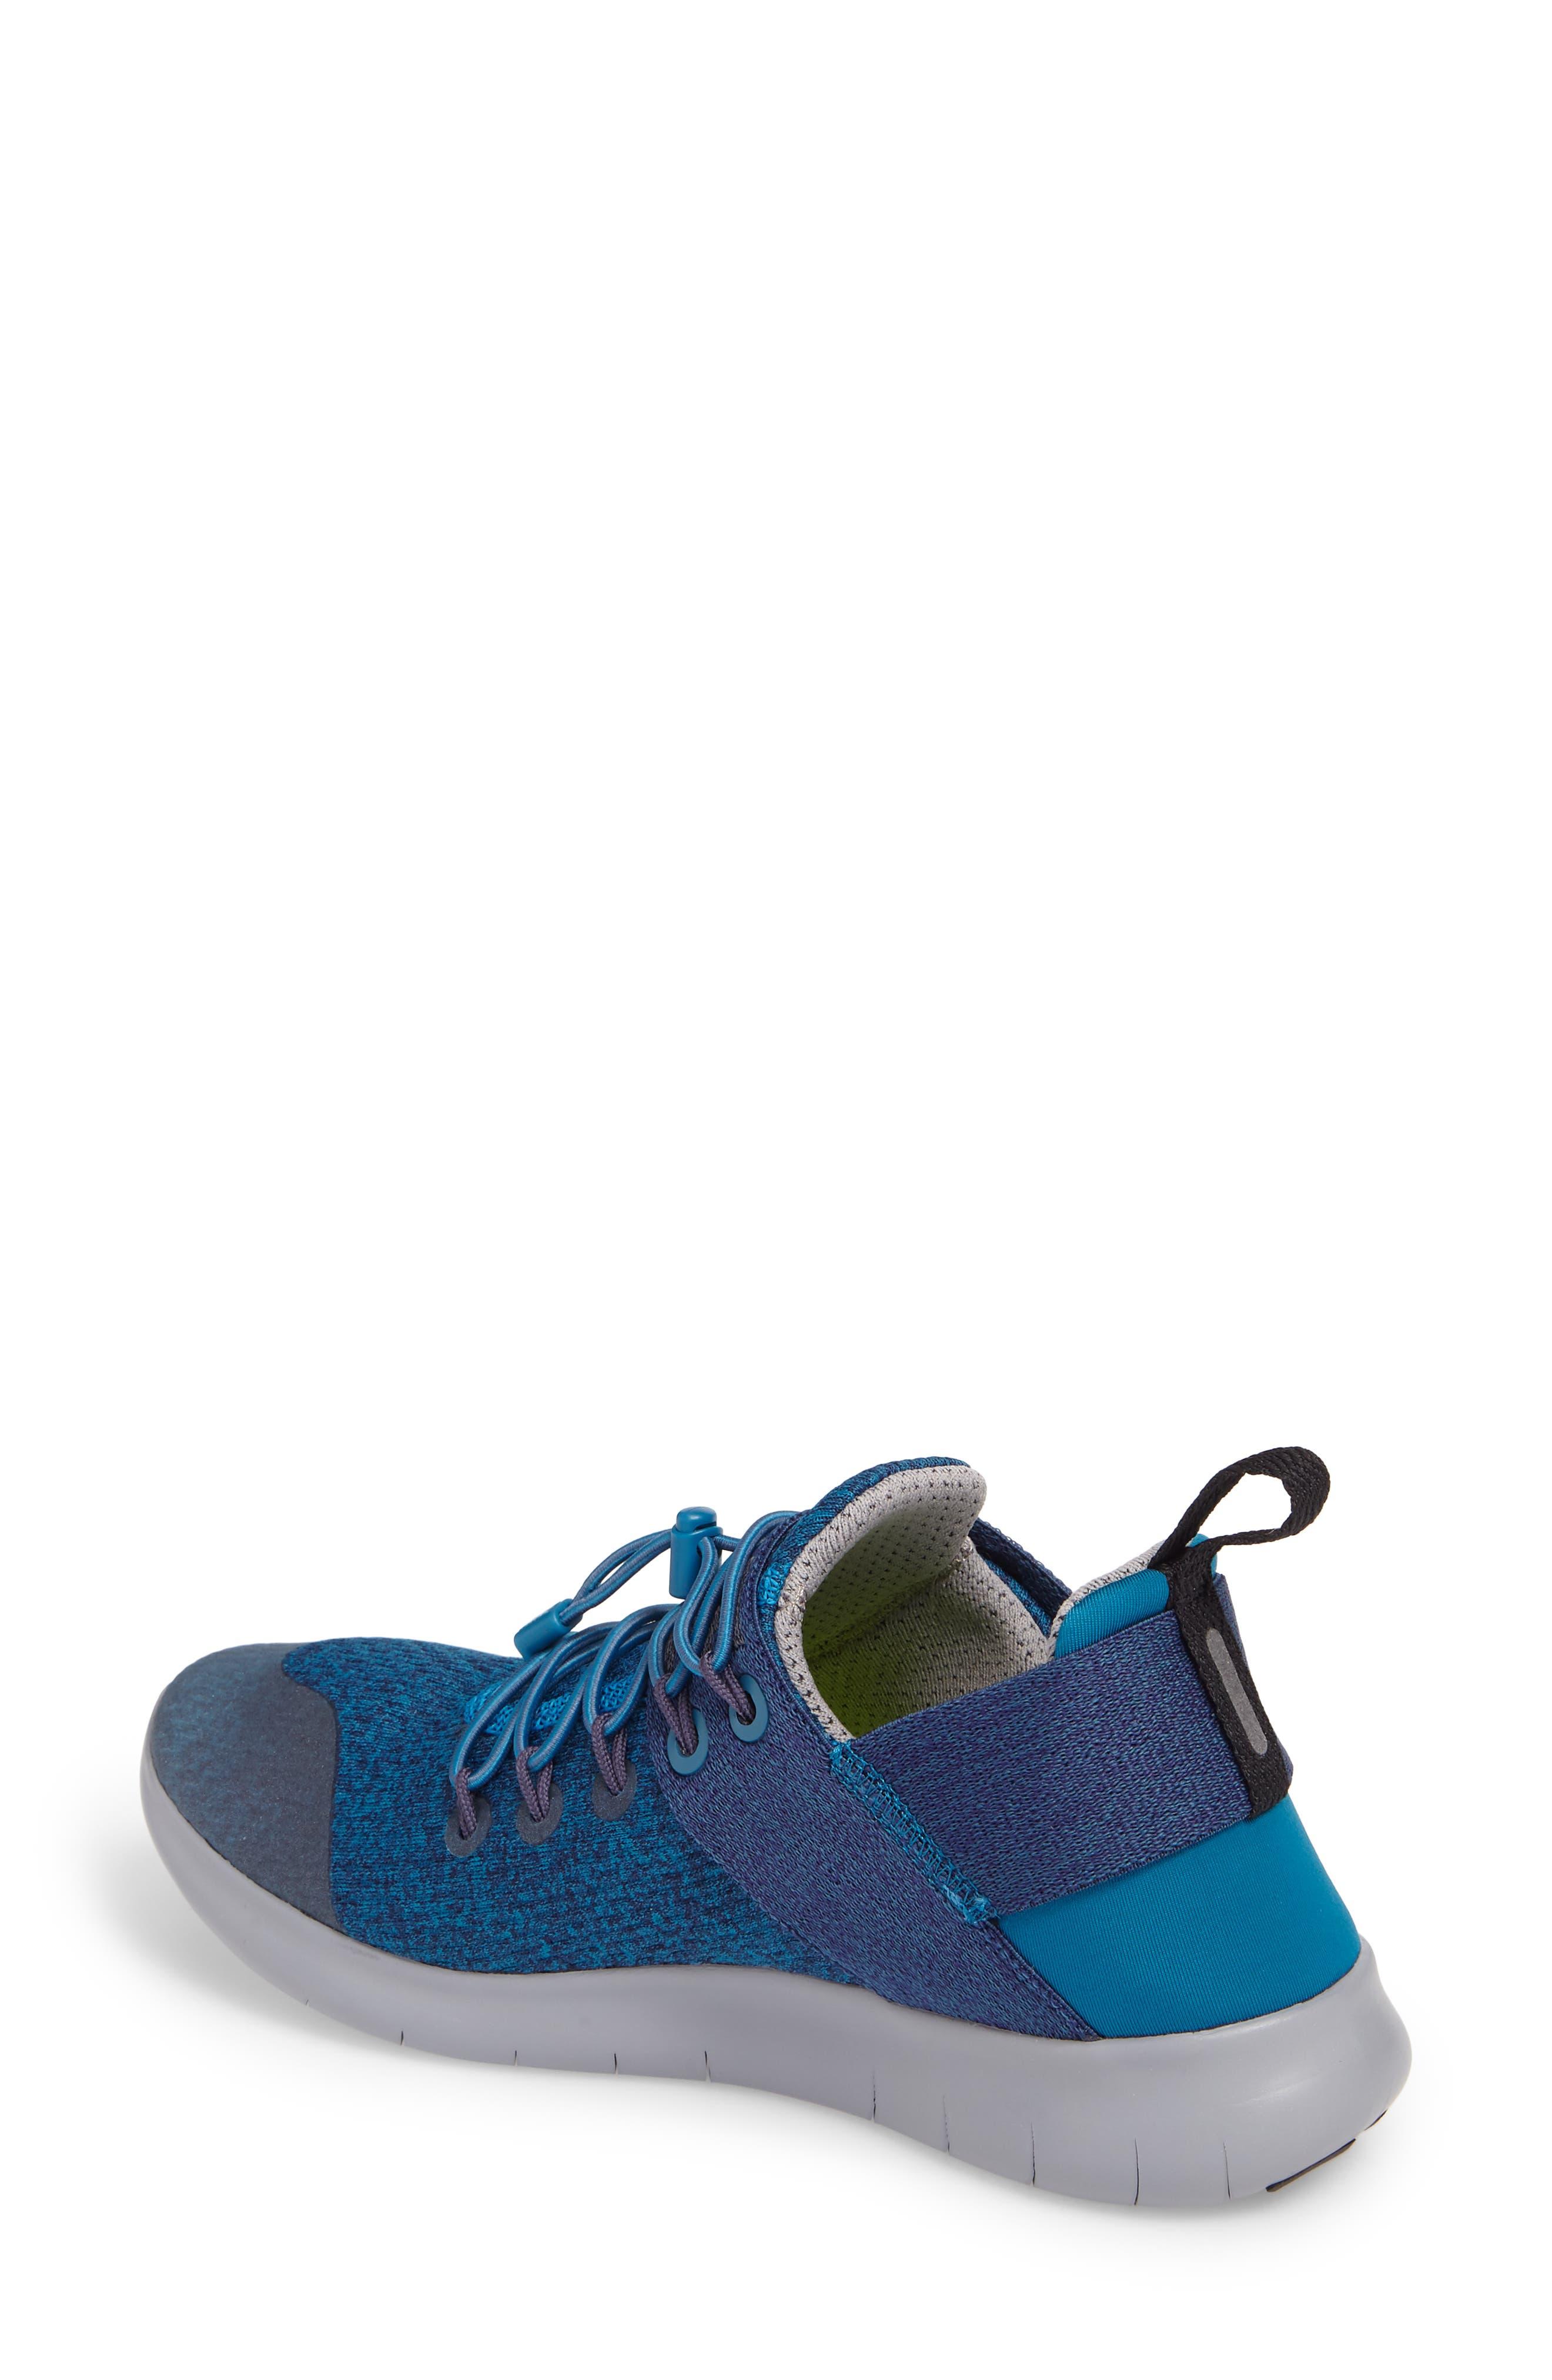 Free RN Commuter 2017 Premium Running Shoe,                             Alternate thumbnail 2, color,                             Green / Black/ Cobblestone